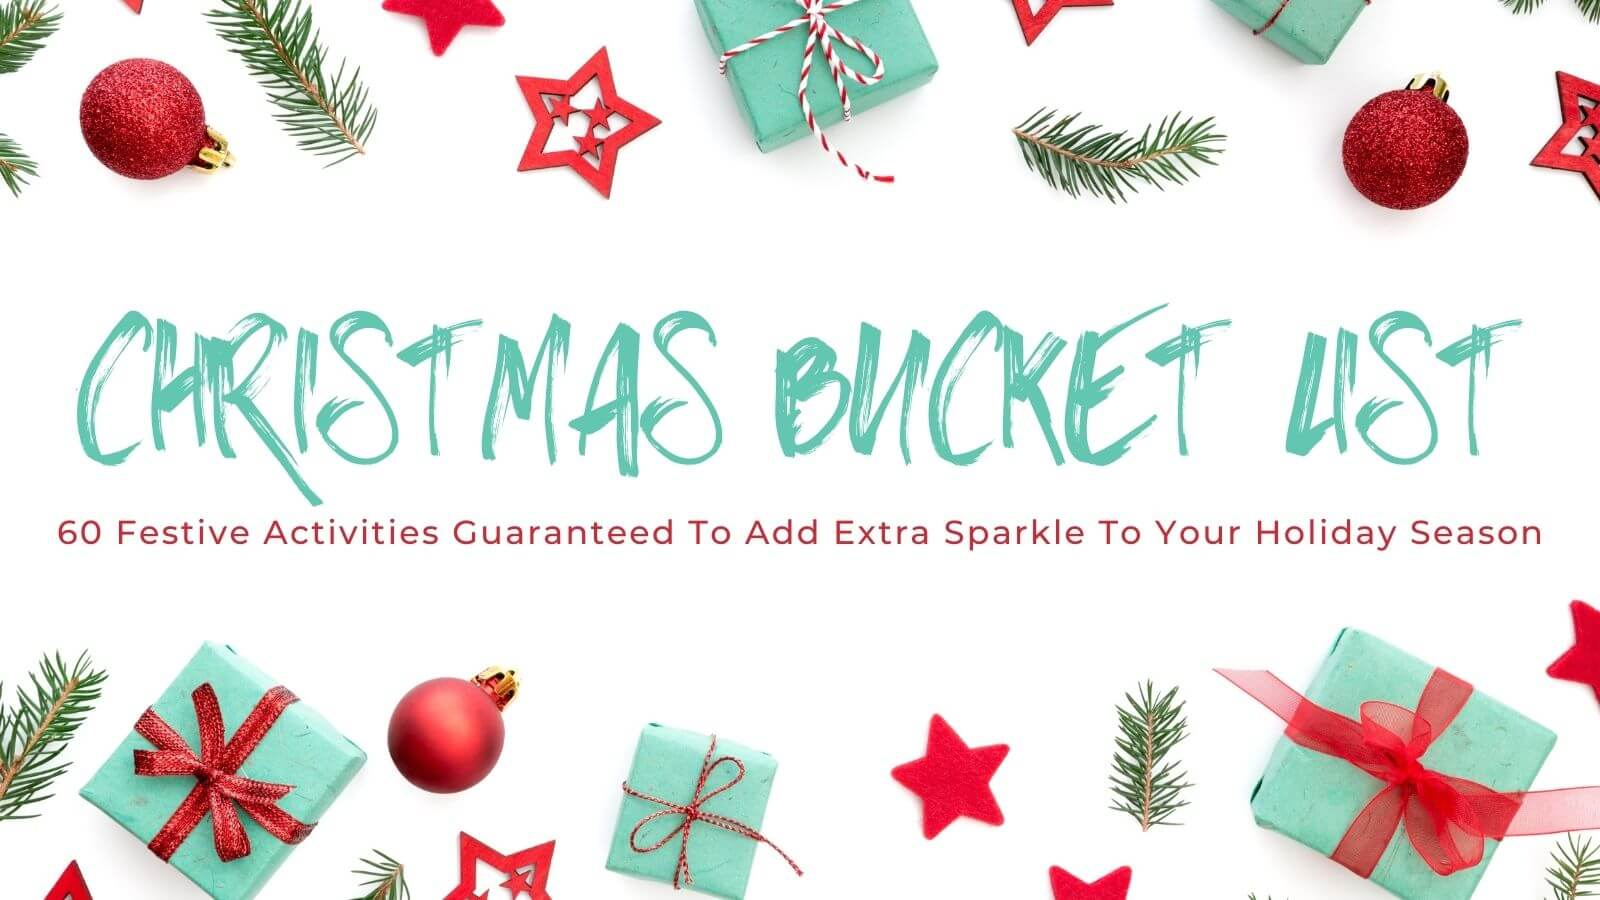 Christmas Bucket List Promo